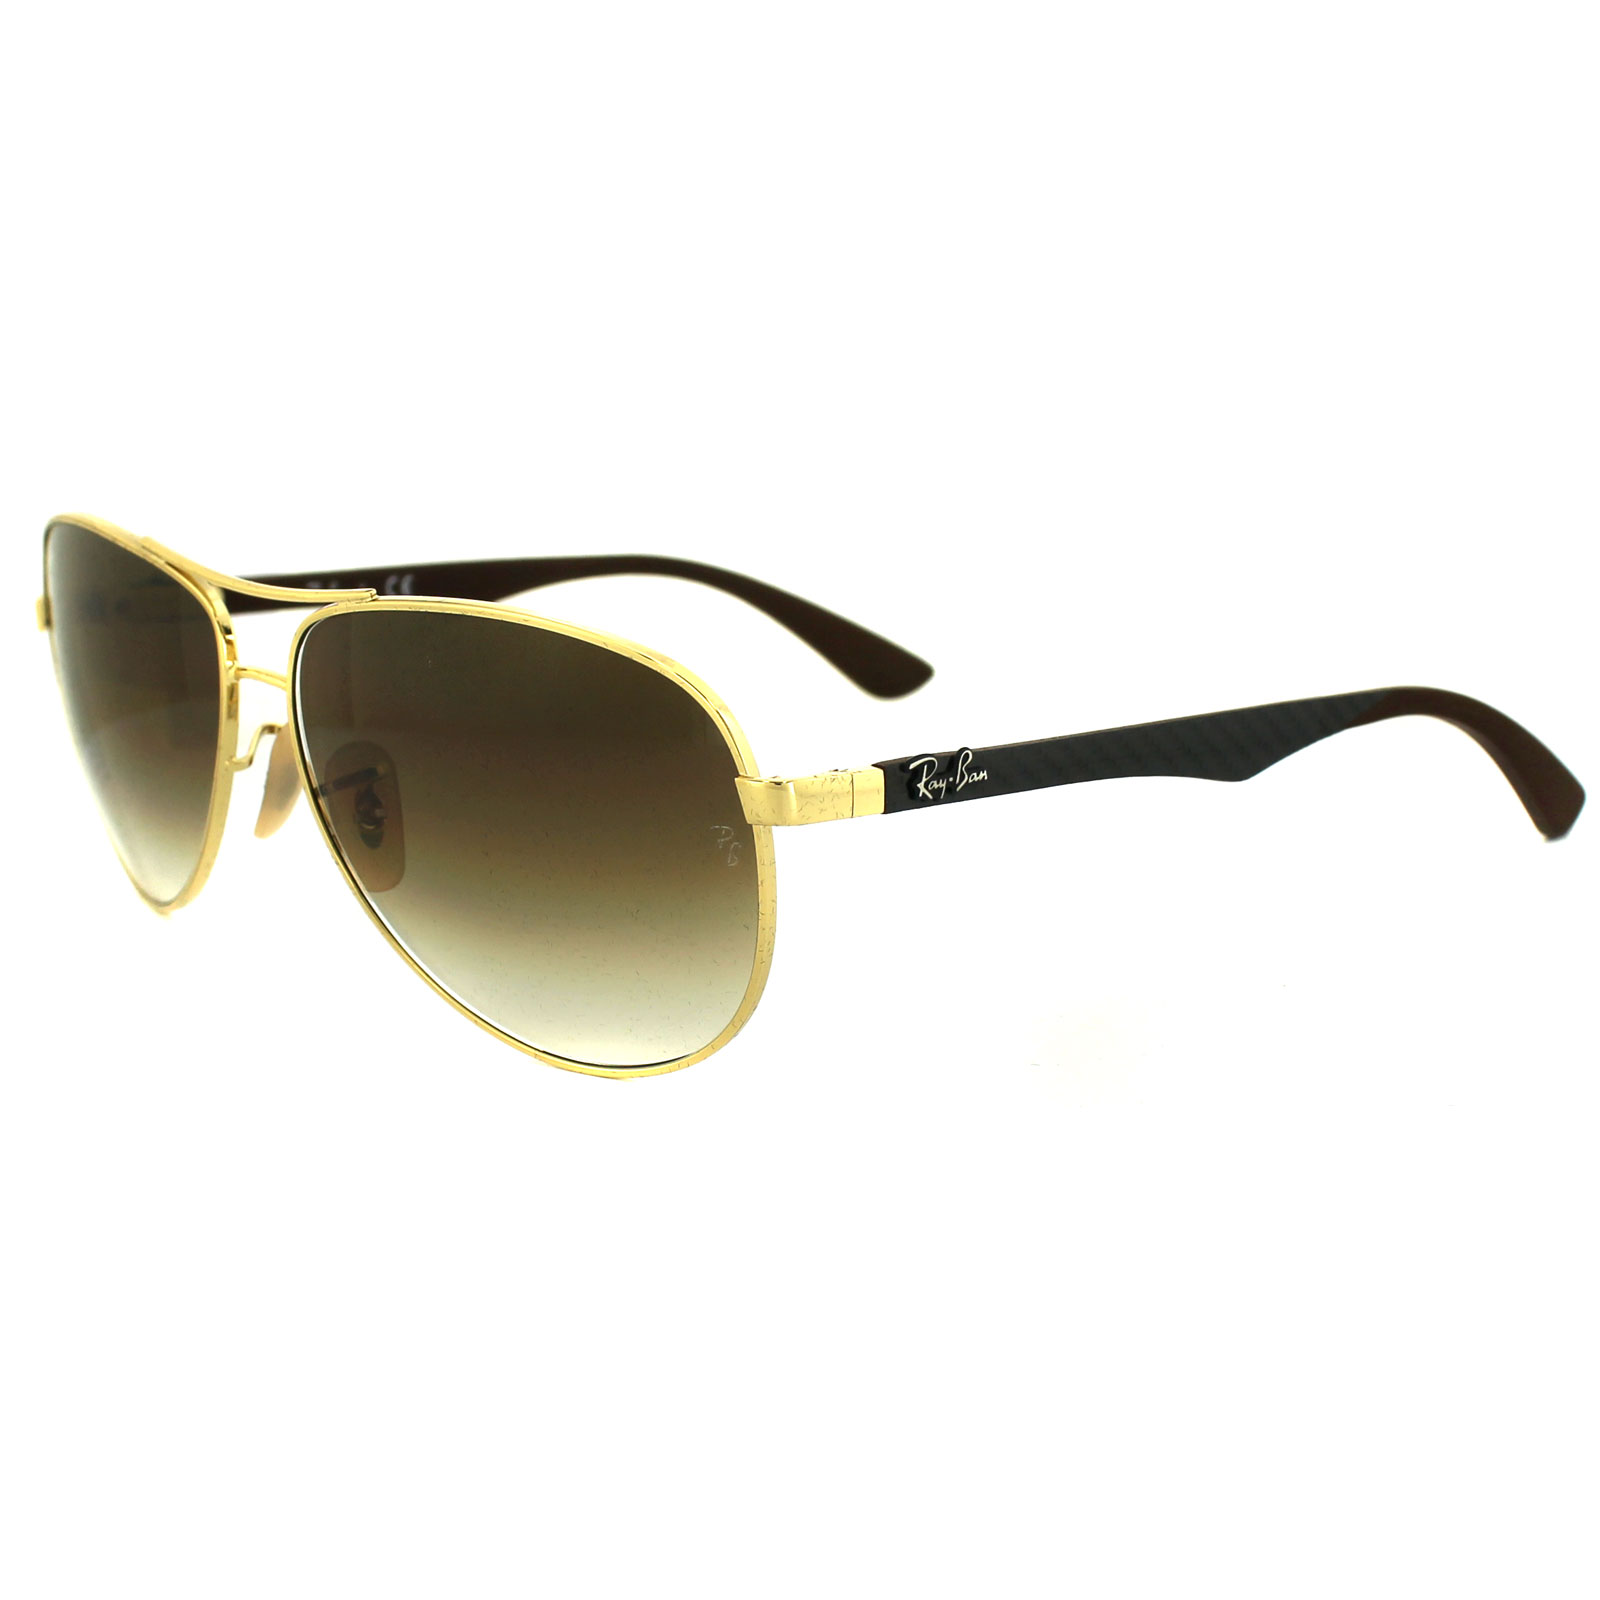 8392f1c5cbb ... czech sentinel ray ban sunglasses 8313 001 51 gold brown gradient cbe91  3d3f9